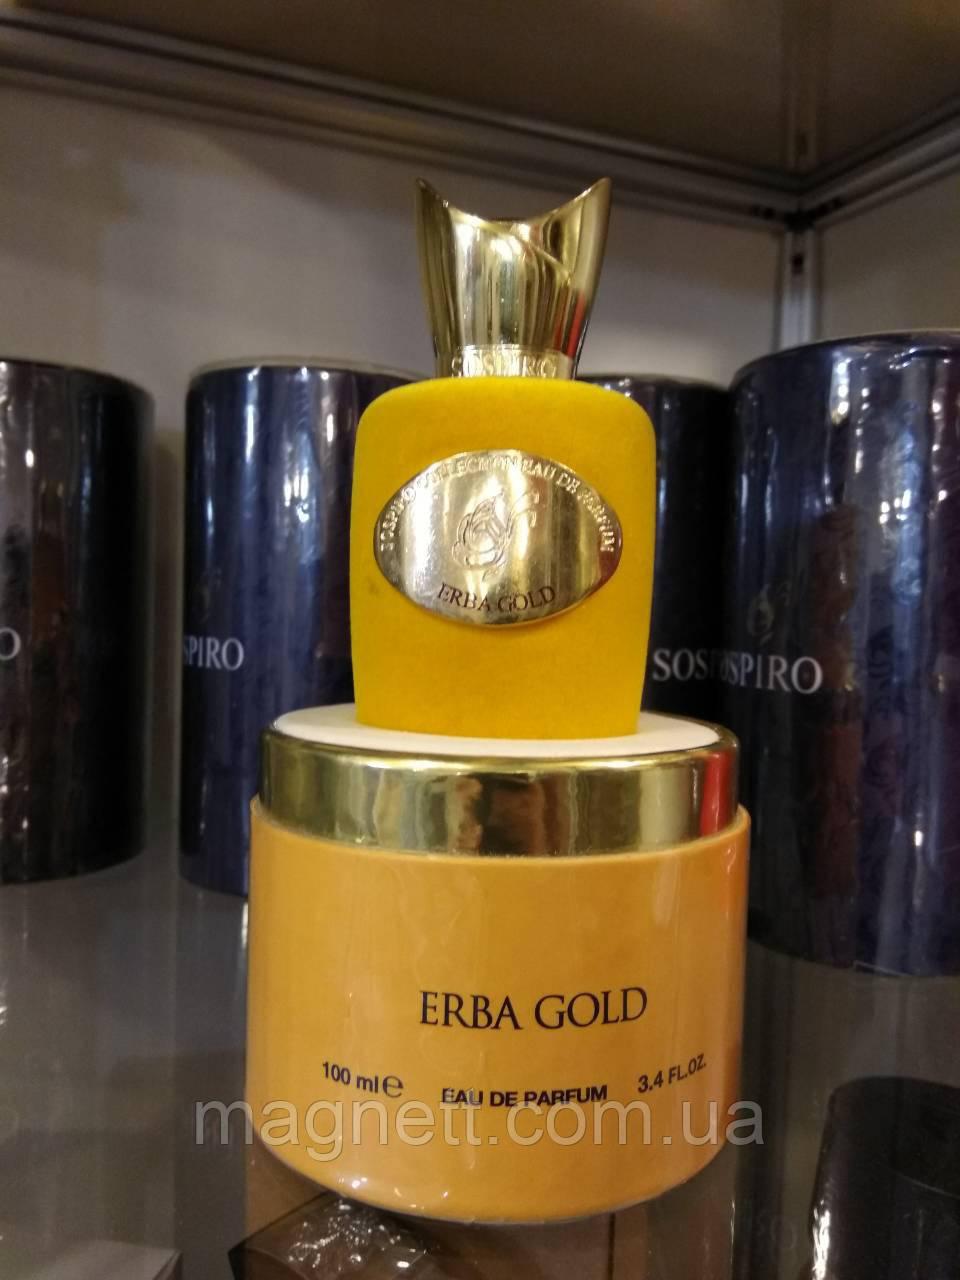 Sospiro Perfumes Erba Gold тестер 100ml